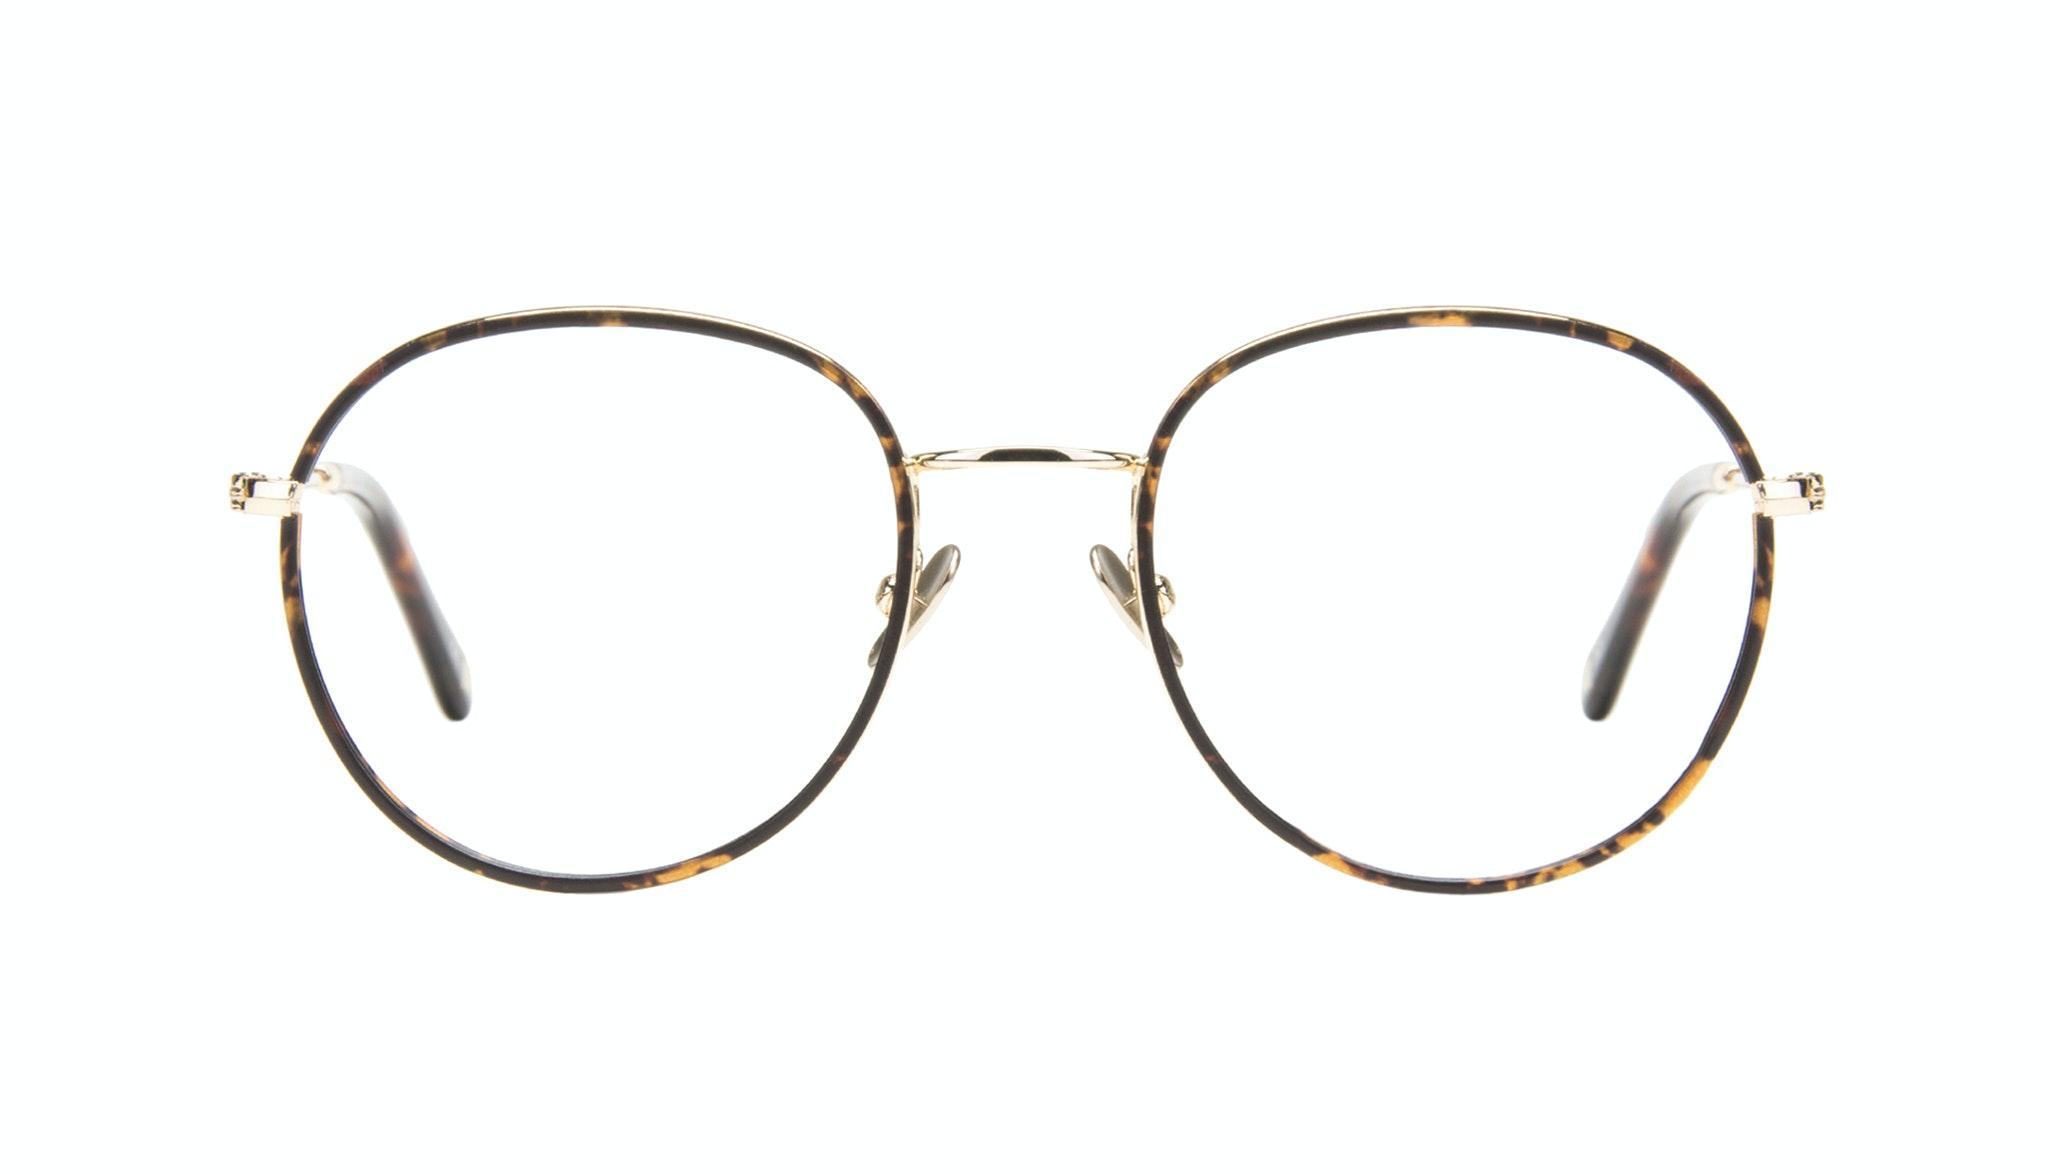 Affordable Fashion Glasses Aviator Round Eyeglasses Women Subrosa Fauve